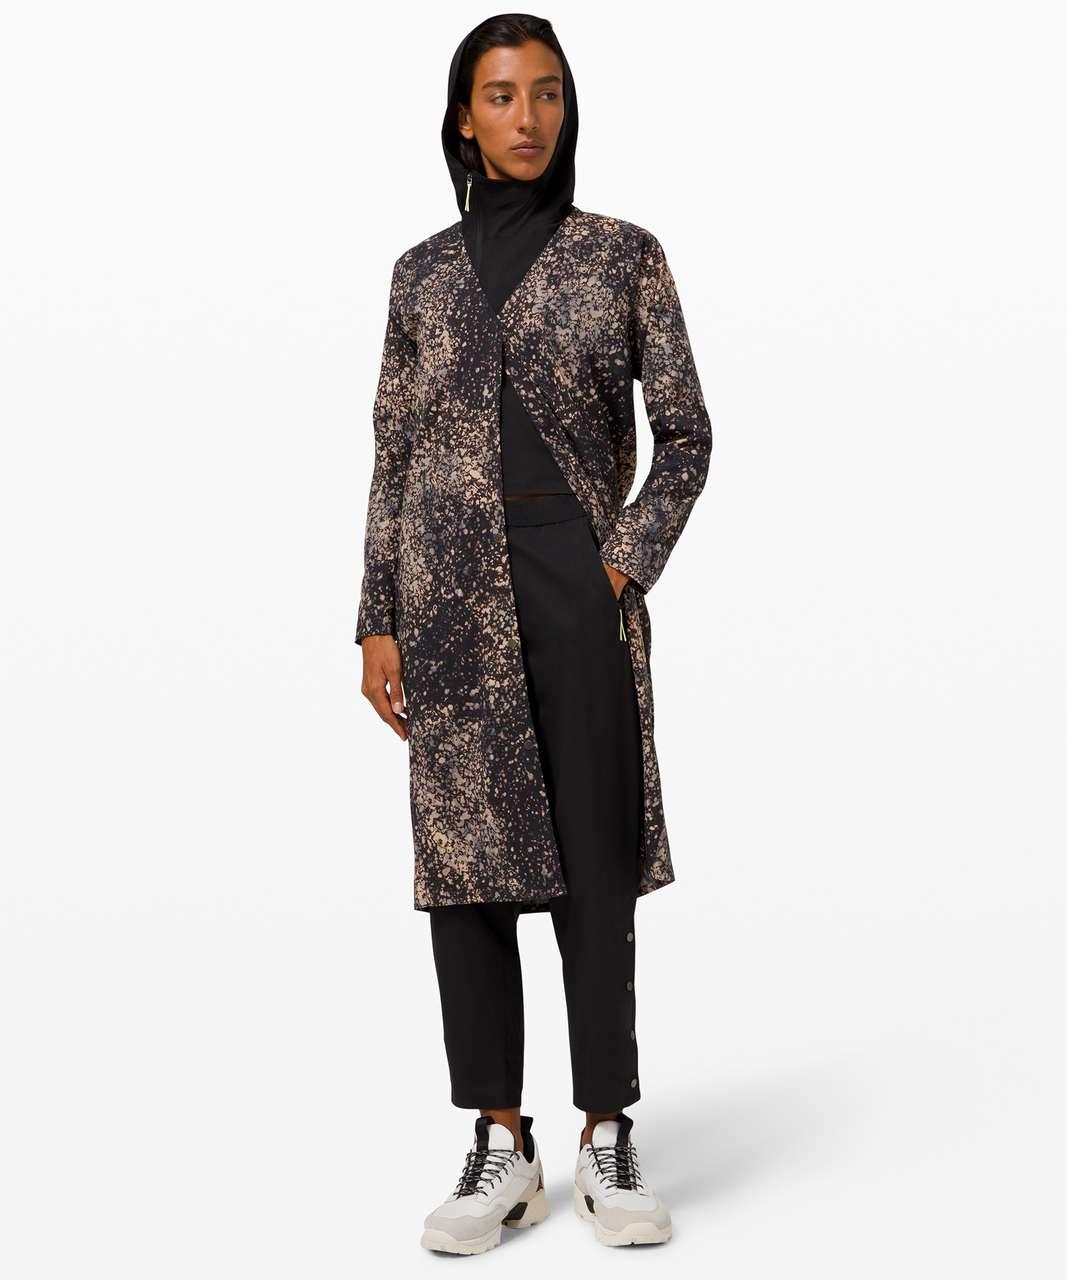 Lululemon Revera Duster Dress *lululemon lab - Planet Surface Black Granite Multi